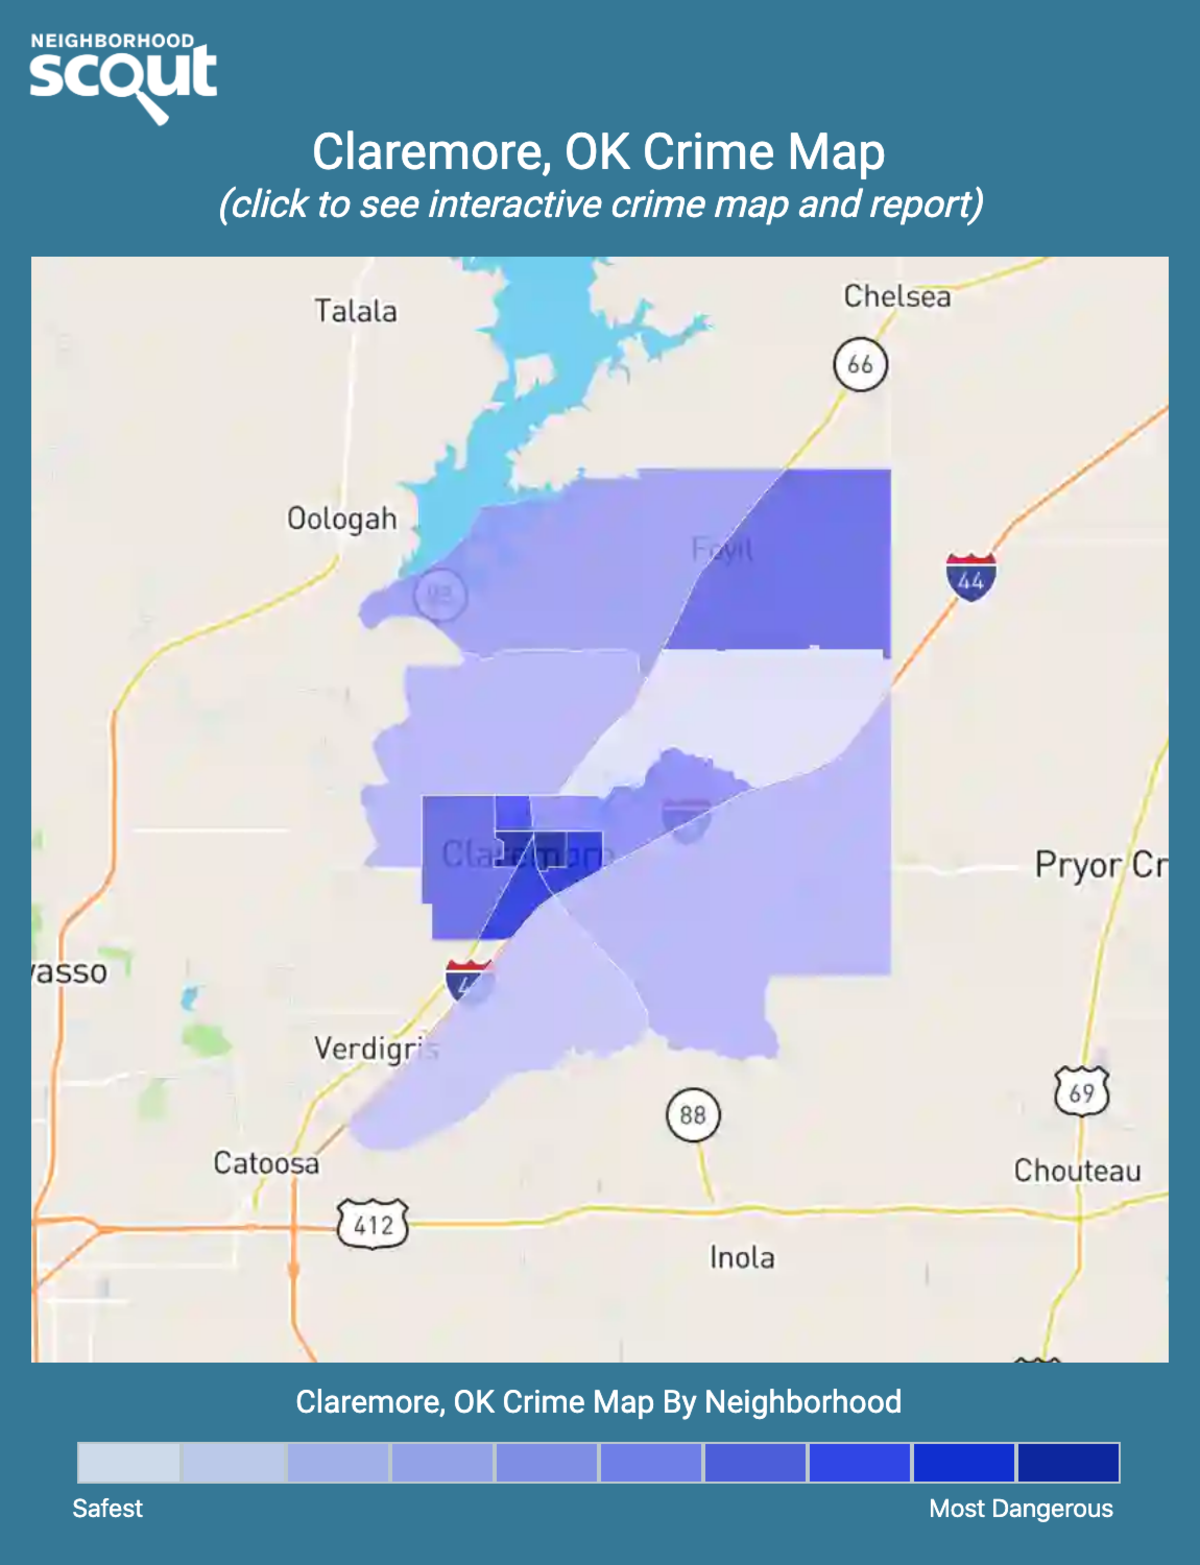 Claremore, Oklahoma crime map